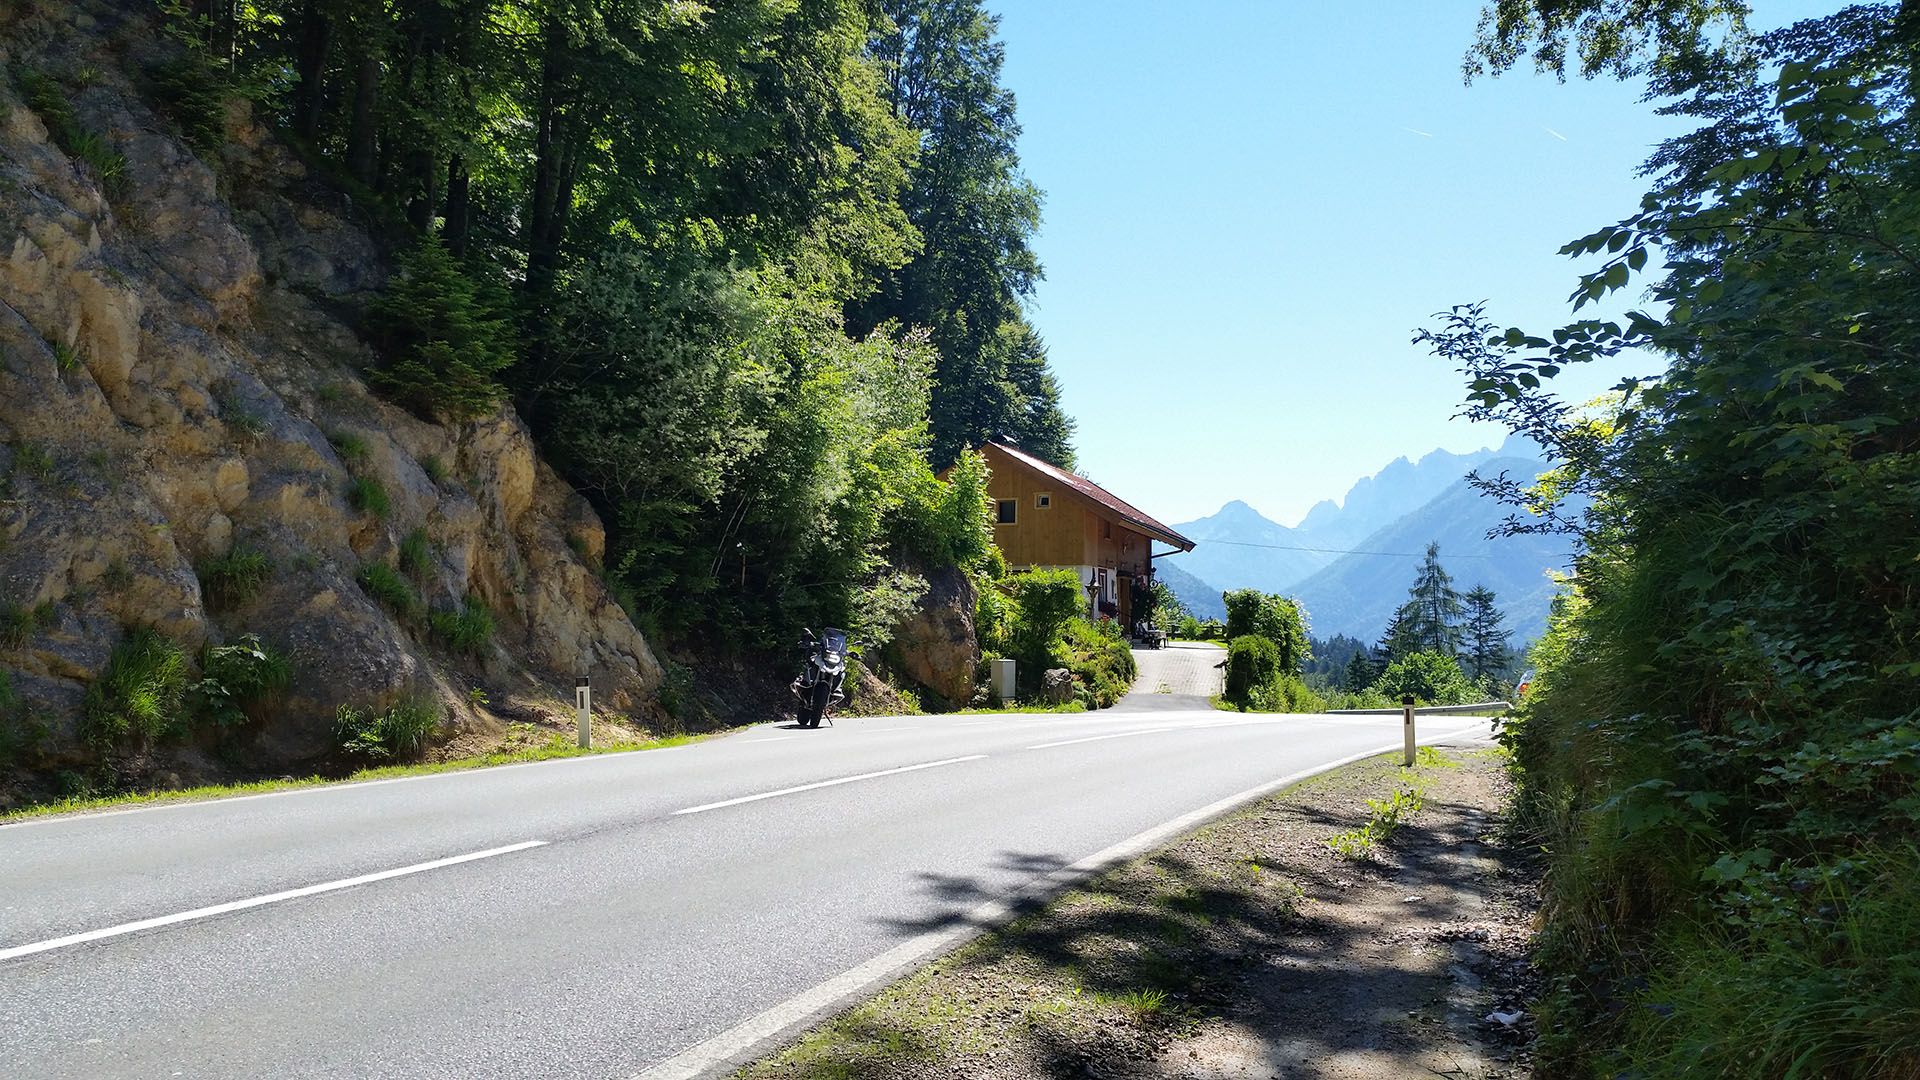 0701 - A-D - Marblinger Höhe